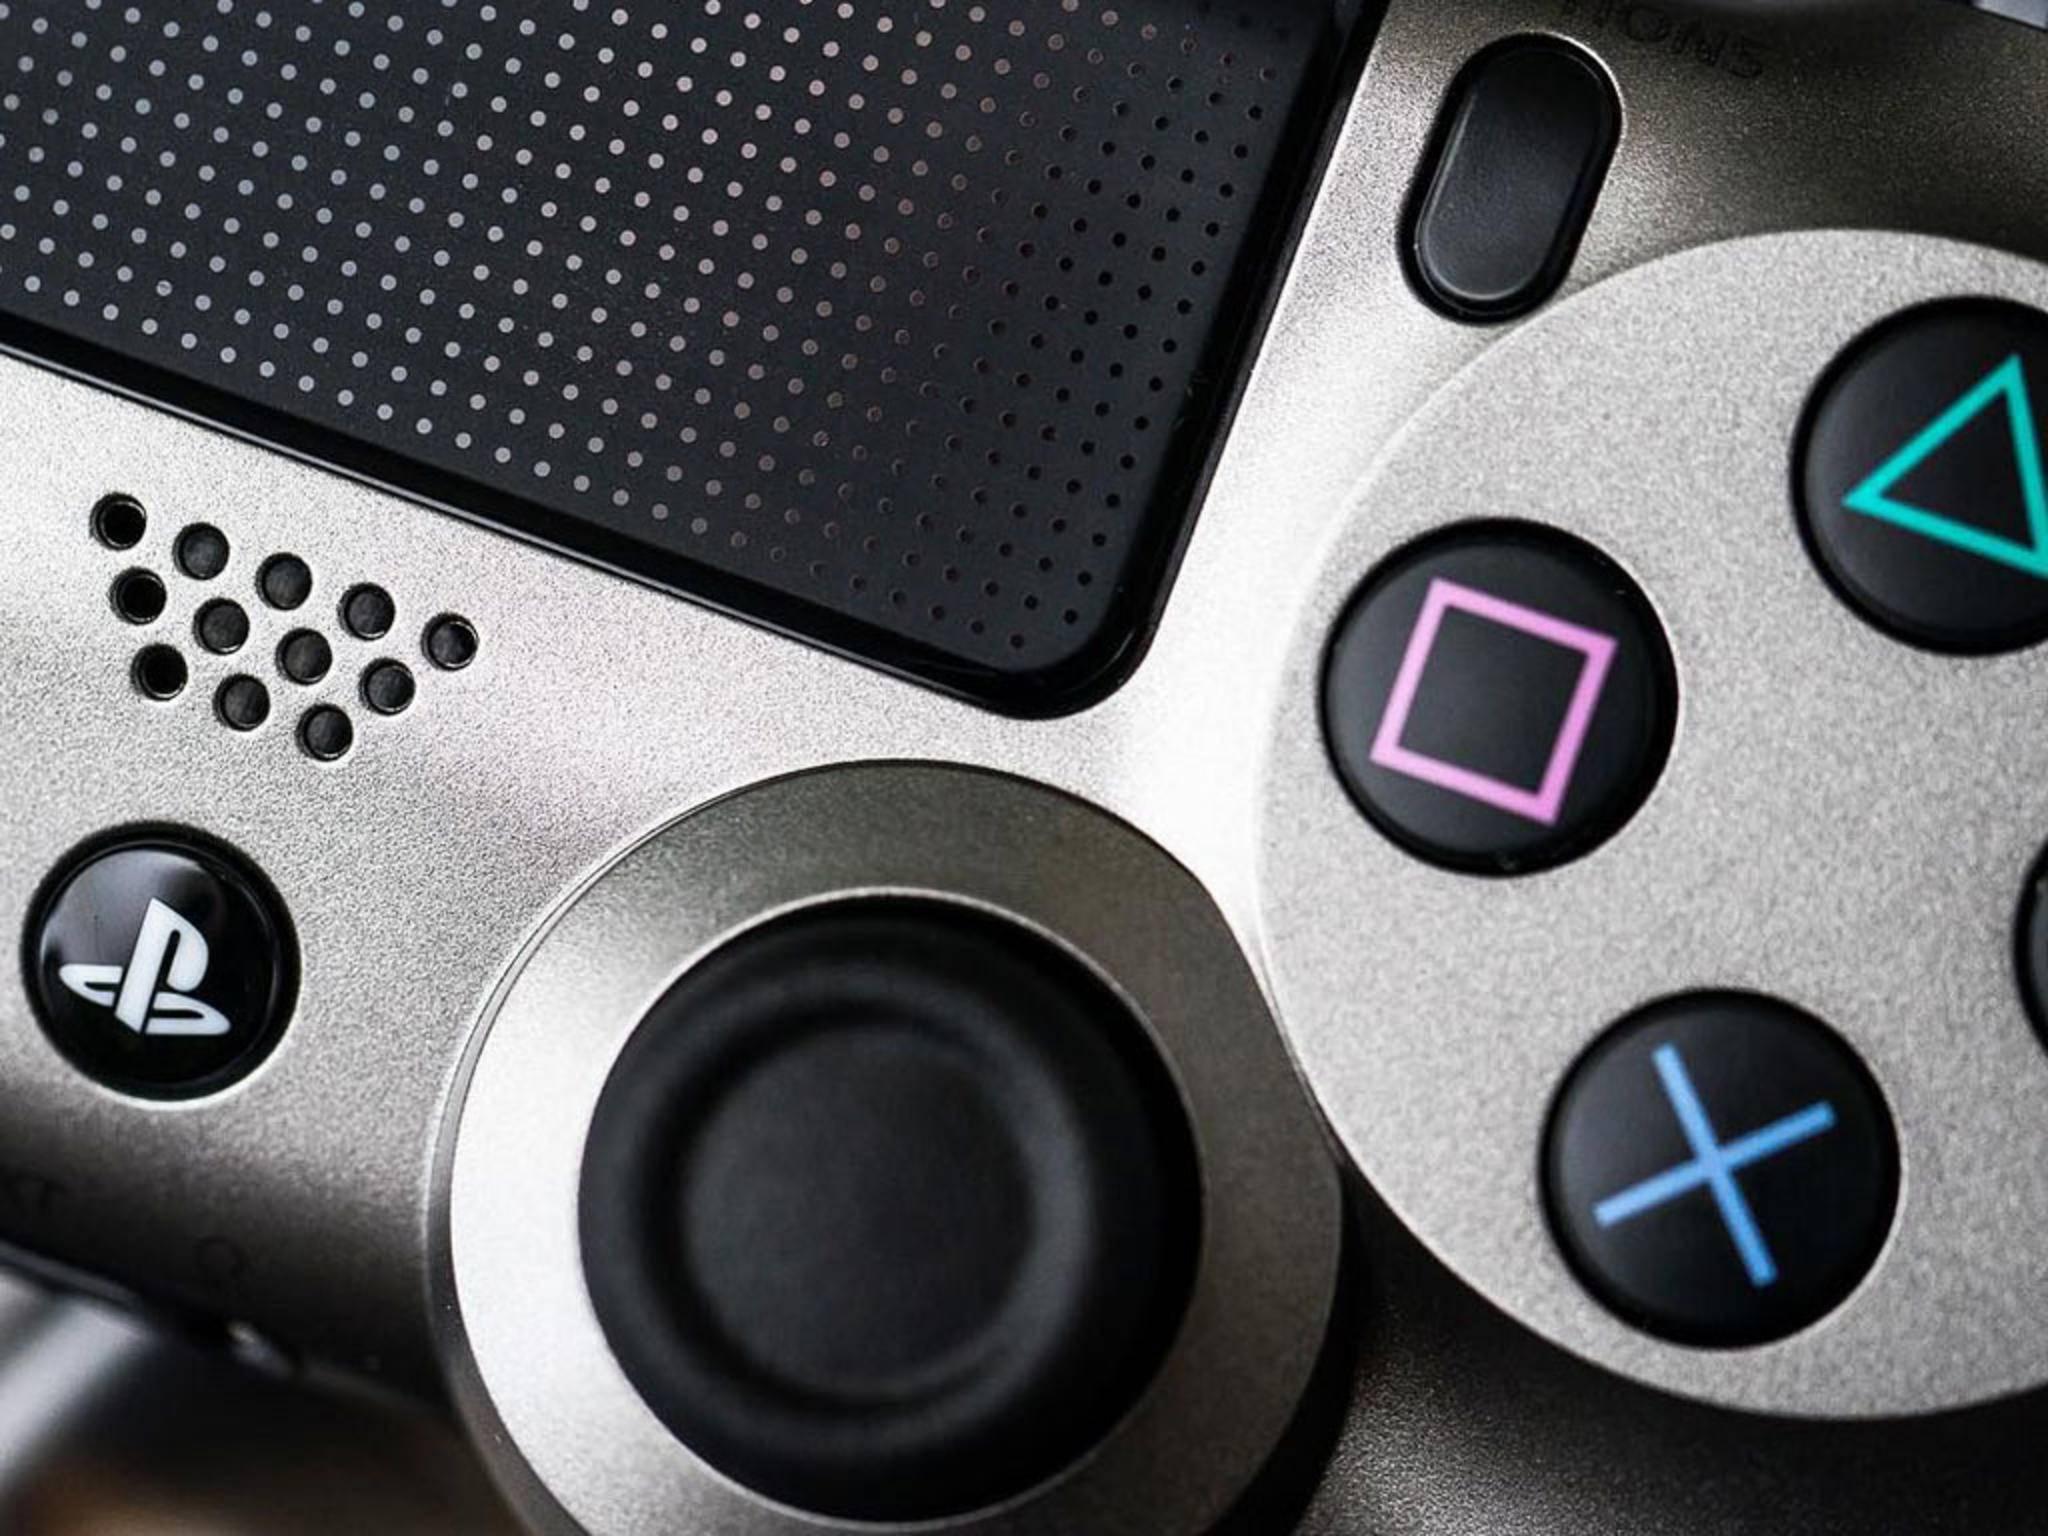 Die PlayStation 4.5 Neo rückt immer näher.